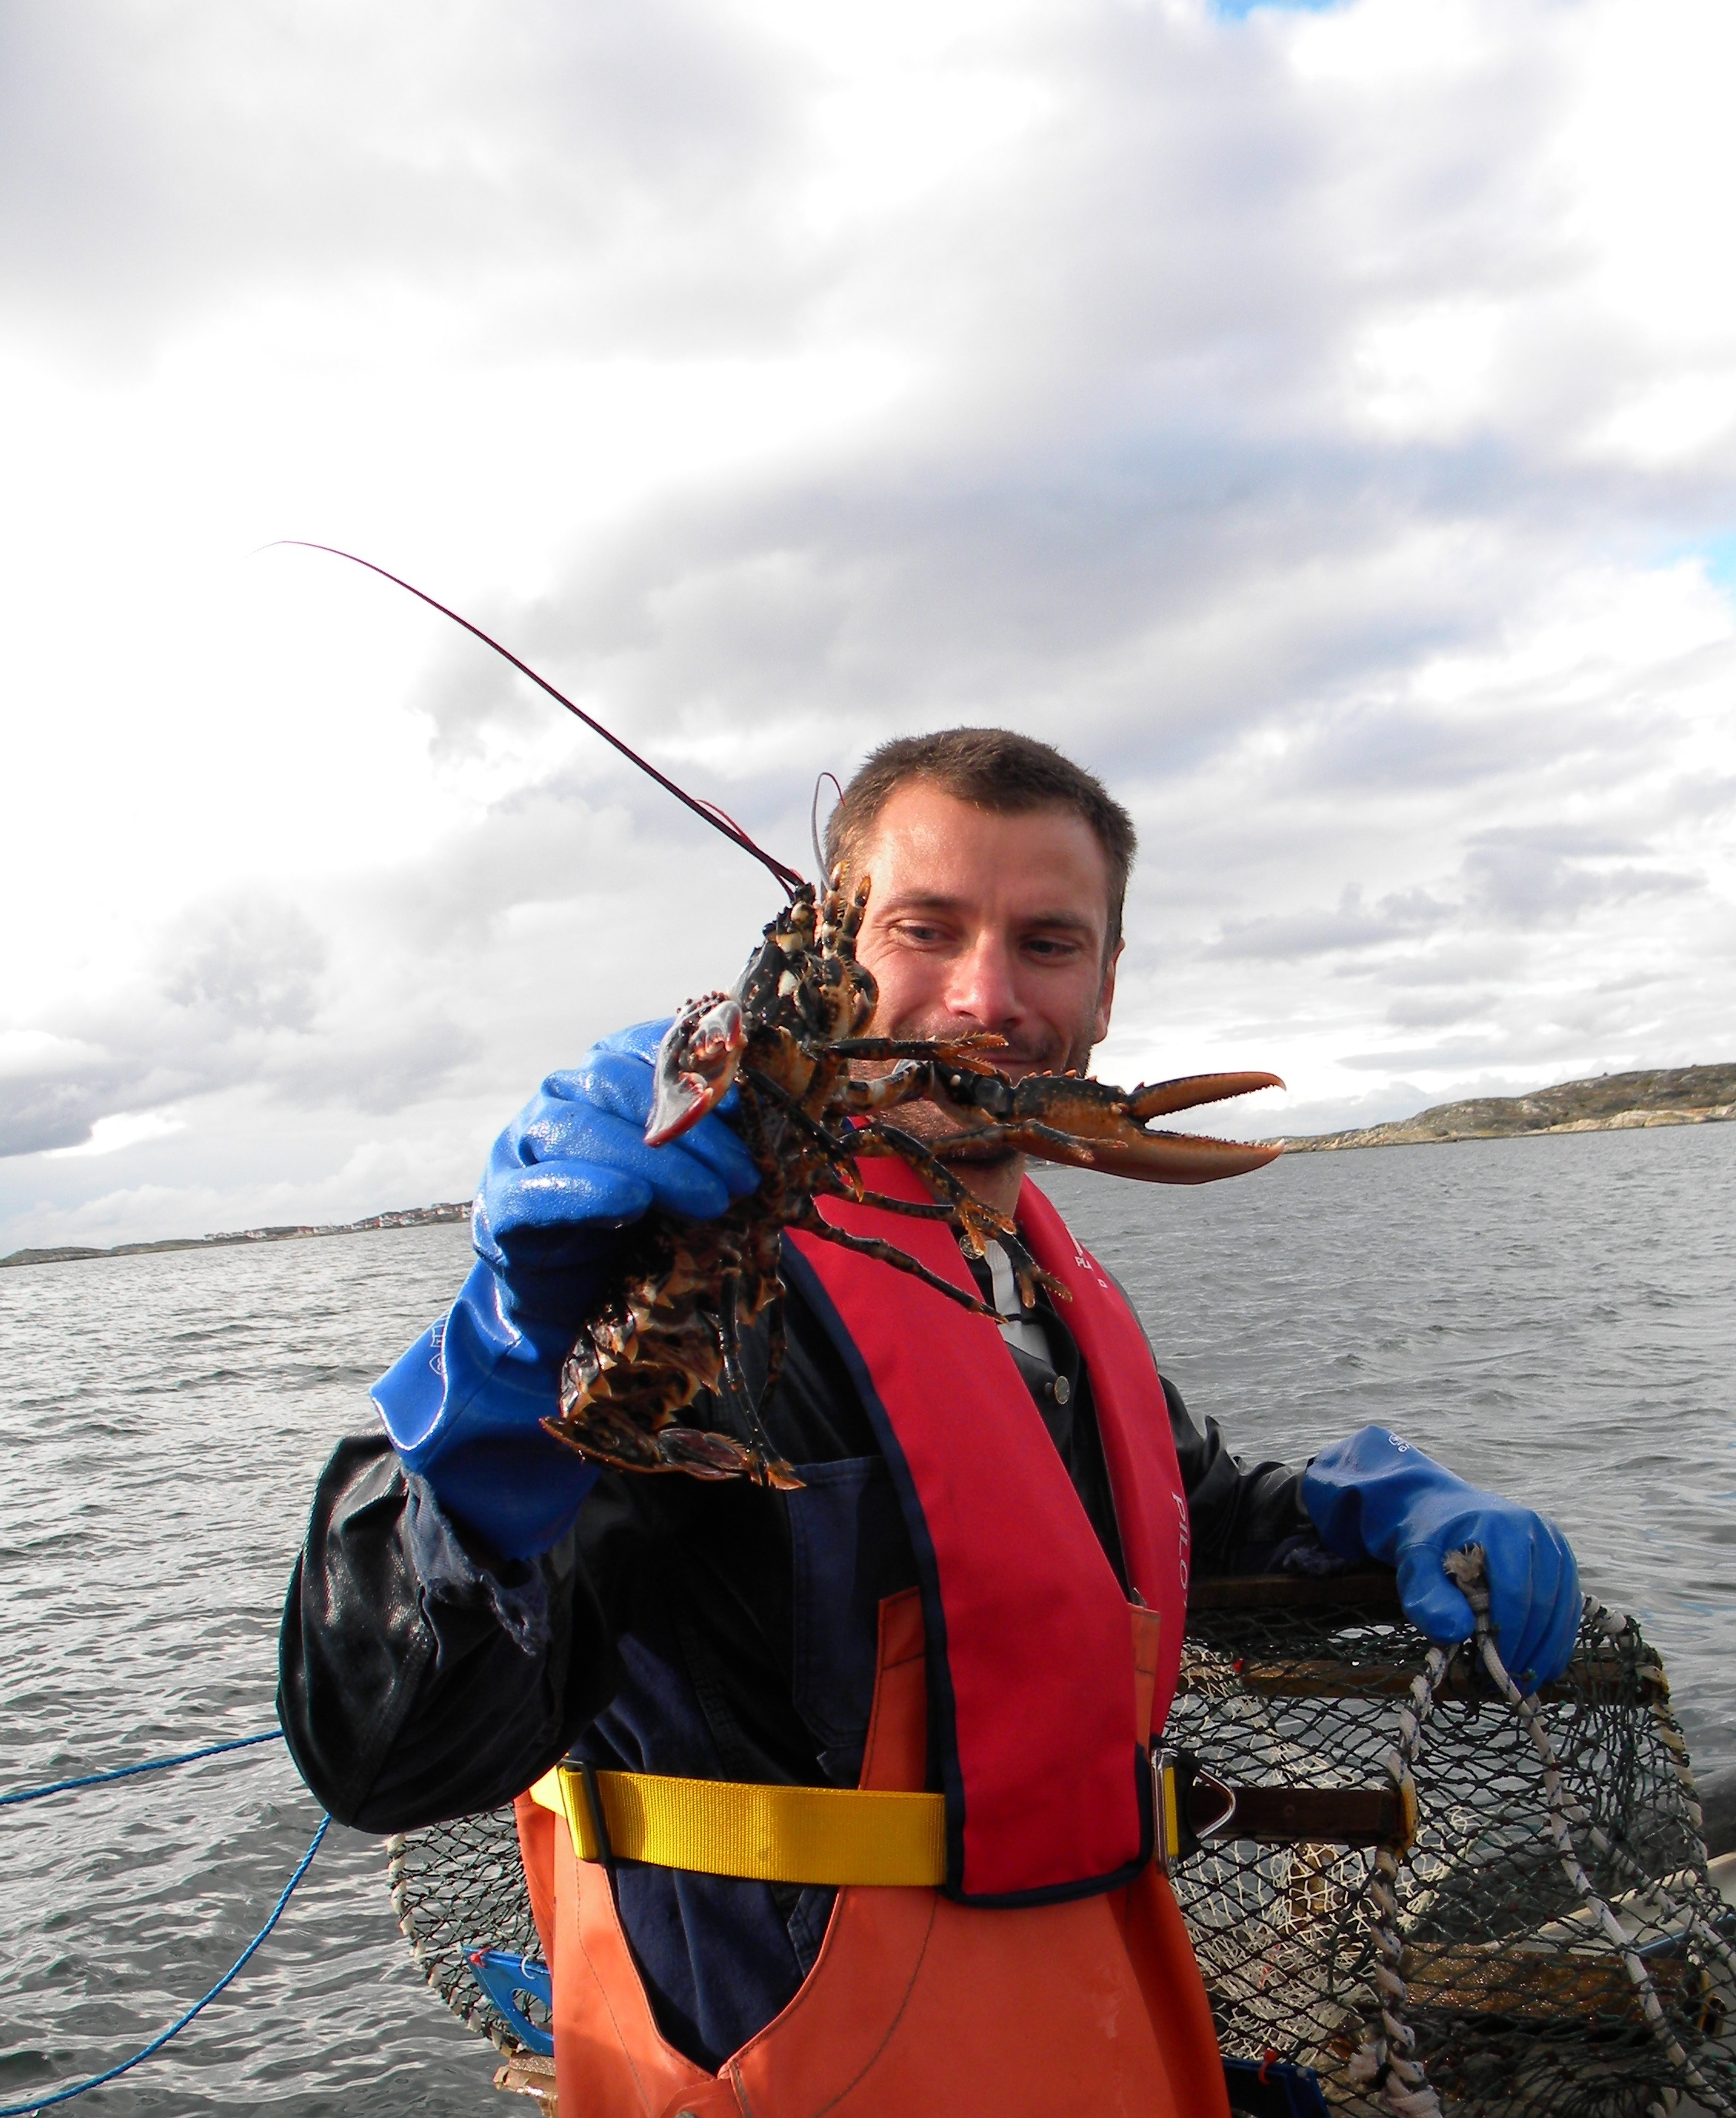 Upplev hummerfiske på västkusten med Seaside Shuttle